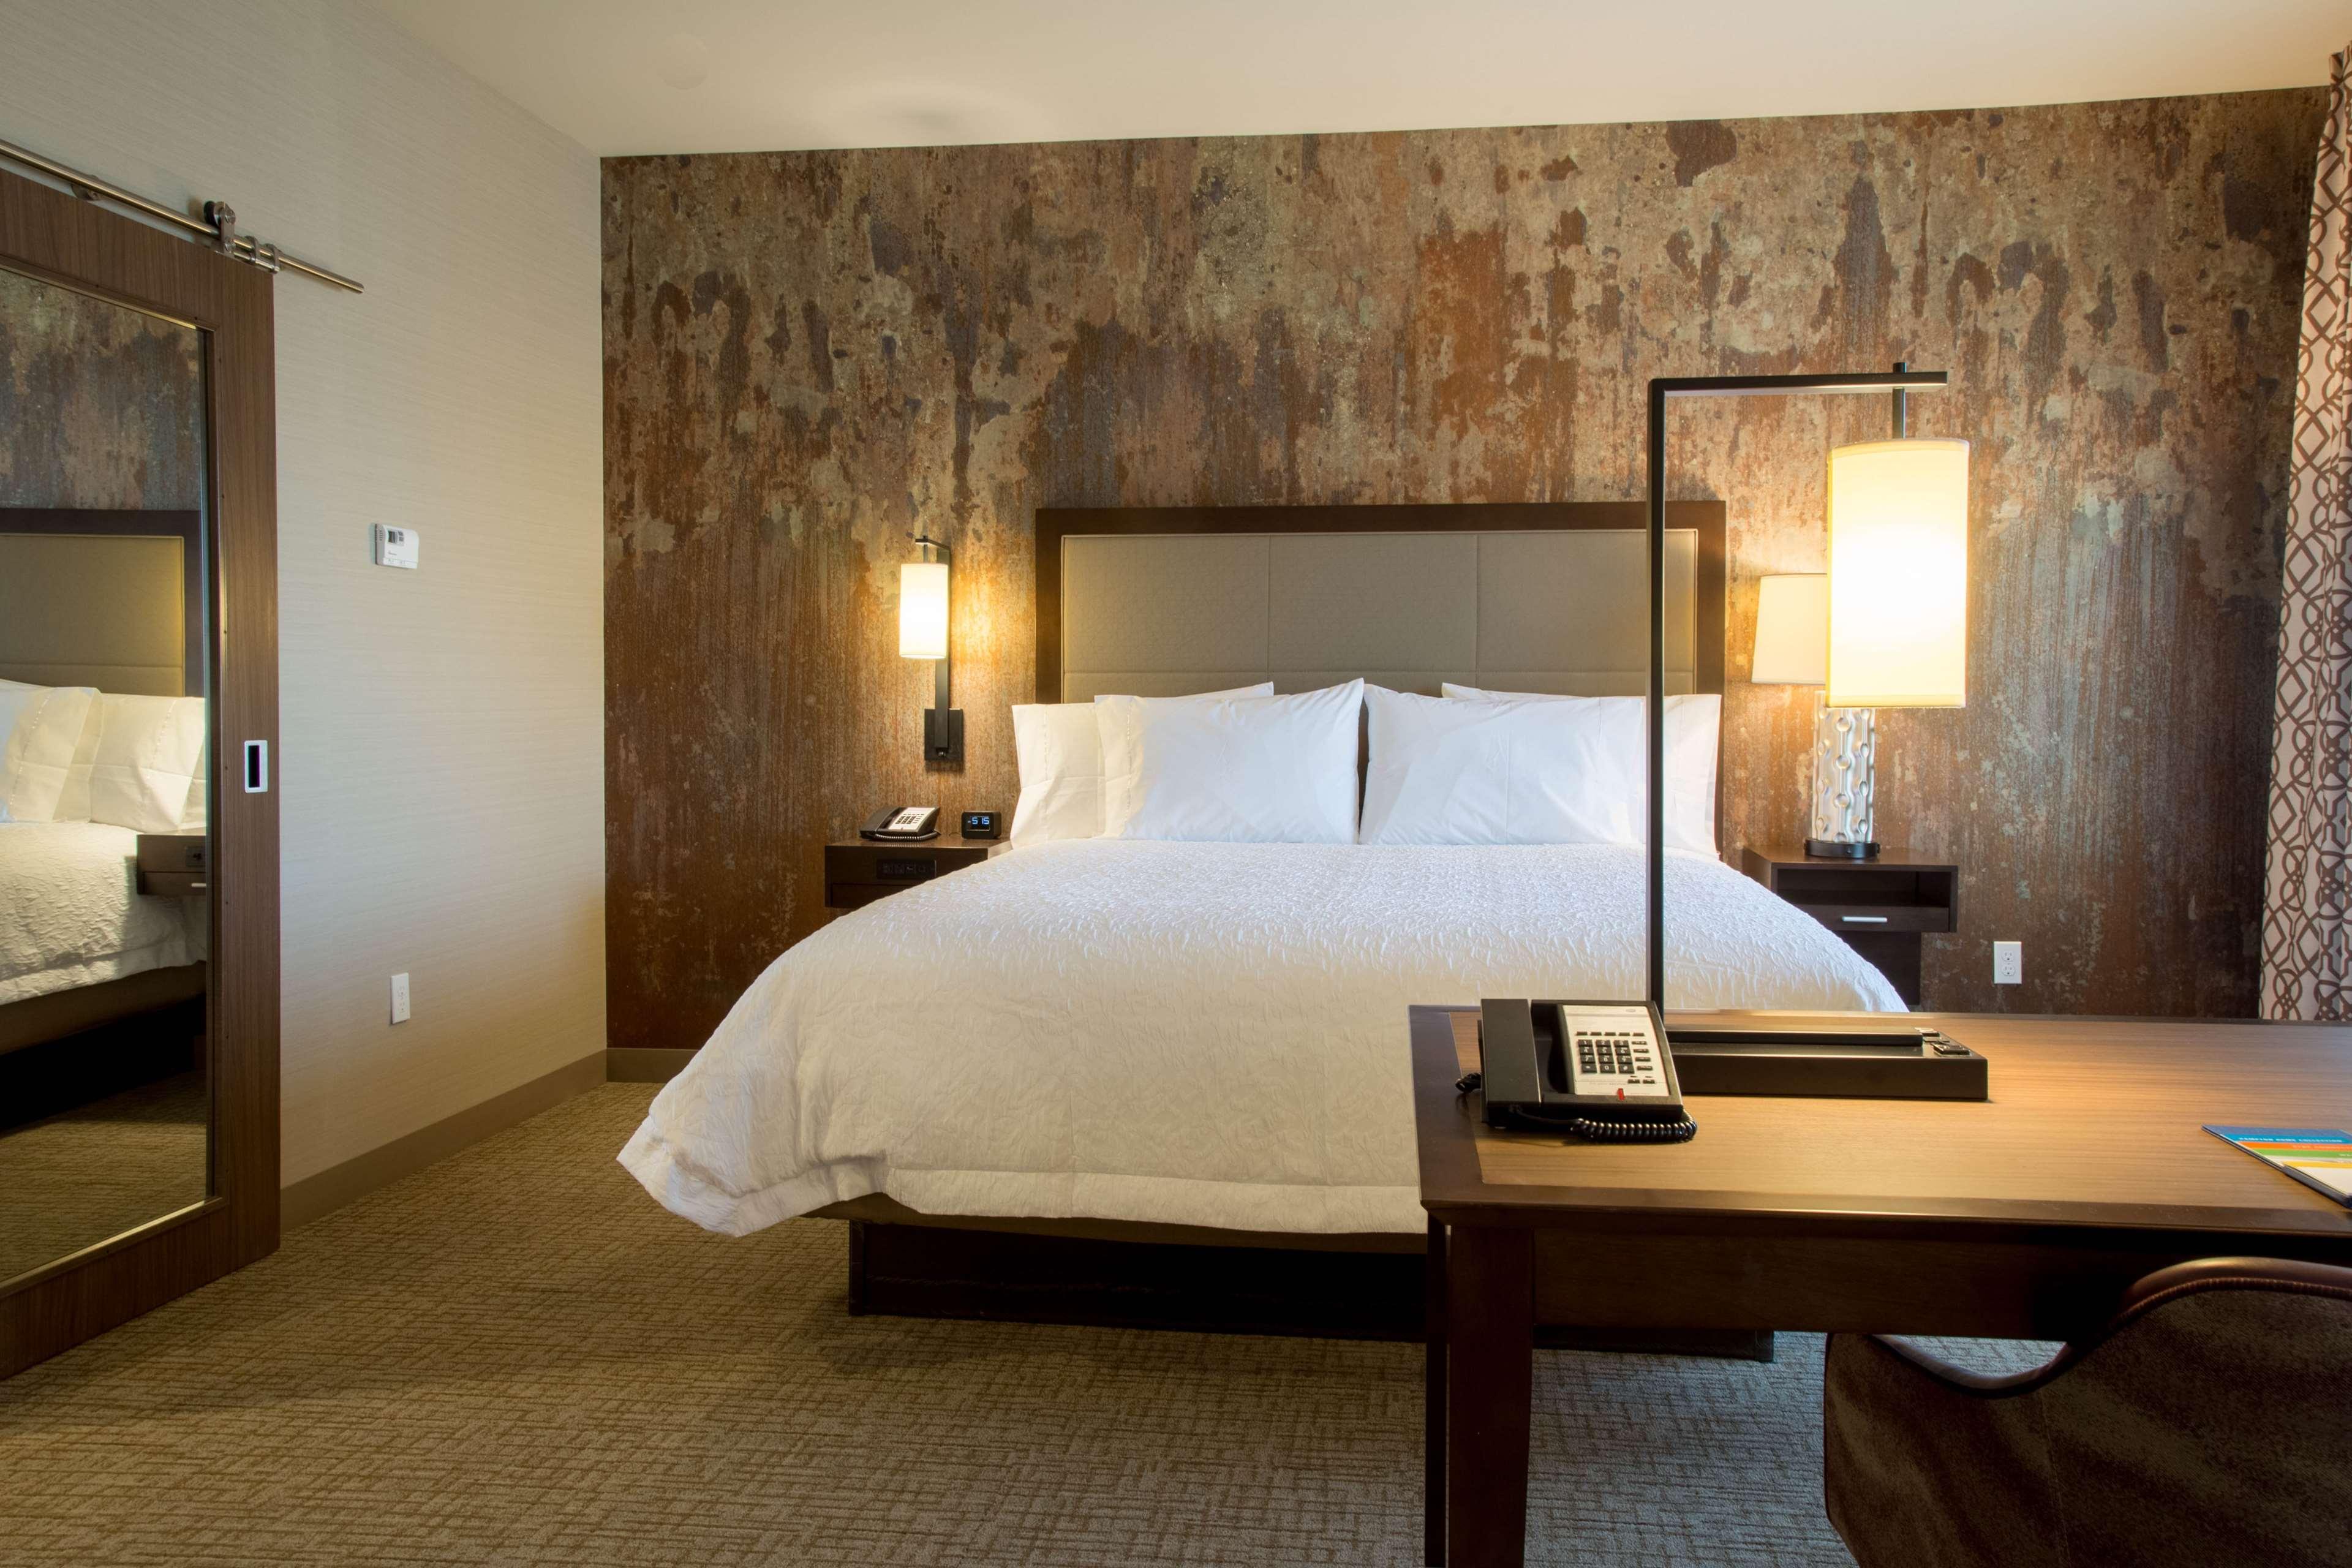 Hampton Inn & Suites Murrieta Temecula image 20